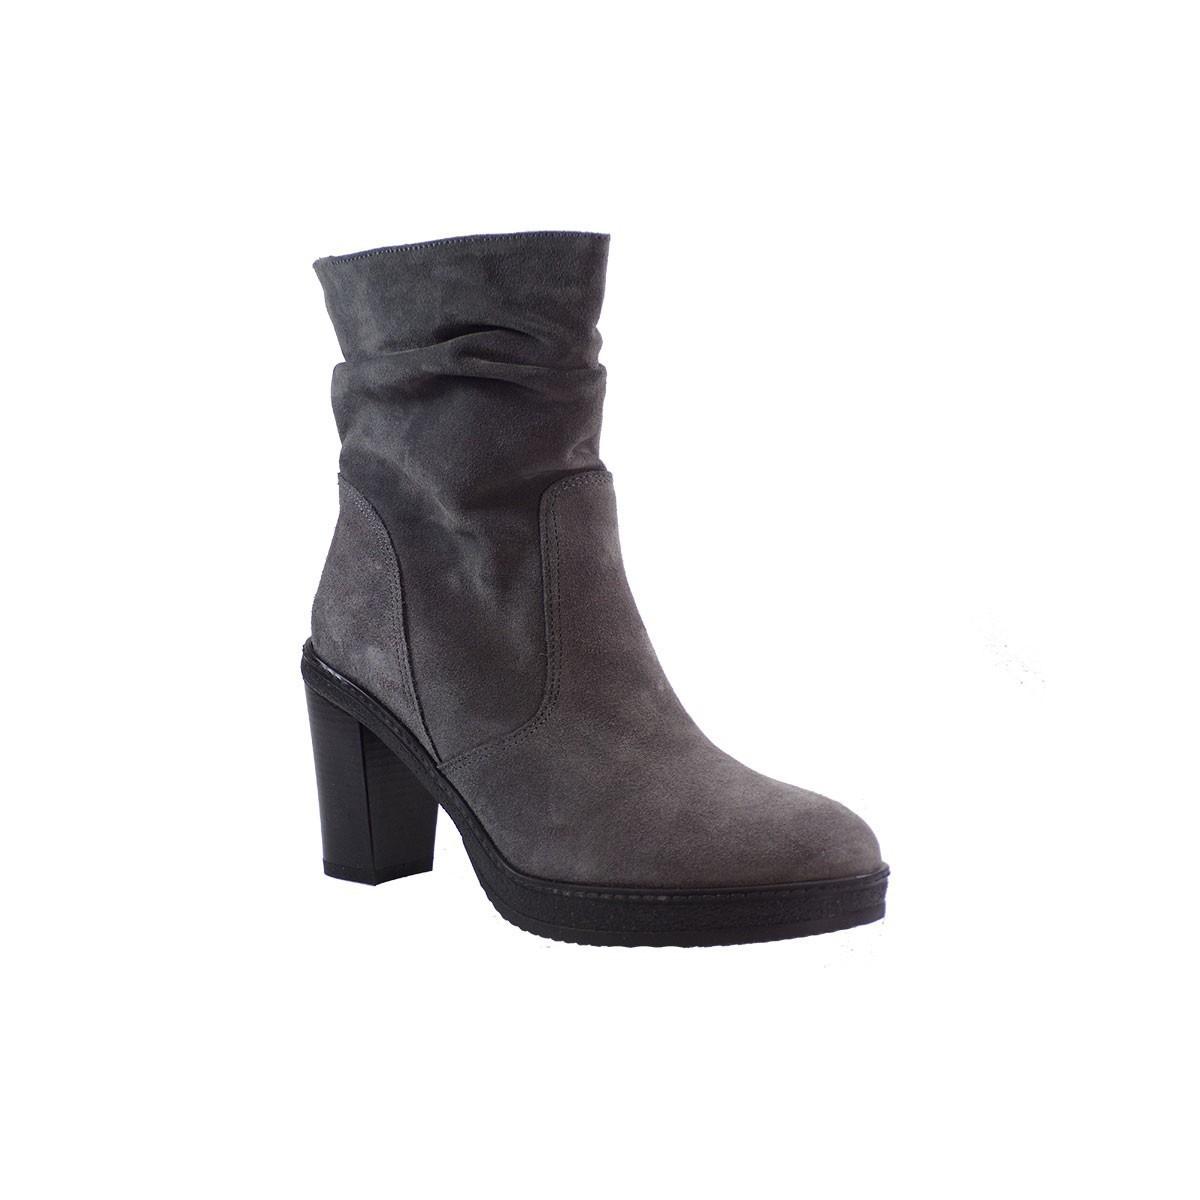 Envie Shoes Γυναικεία Παπούτσια Μποτάκια Ε02-6340 Γκρι Δέρμα Καστόρι